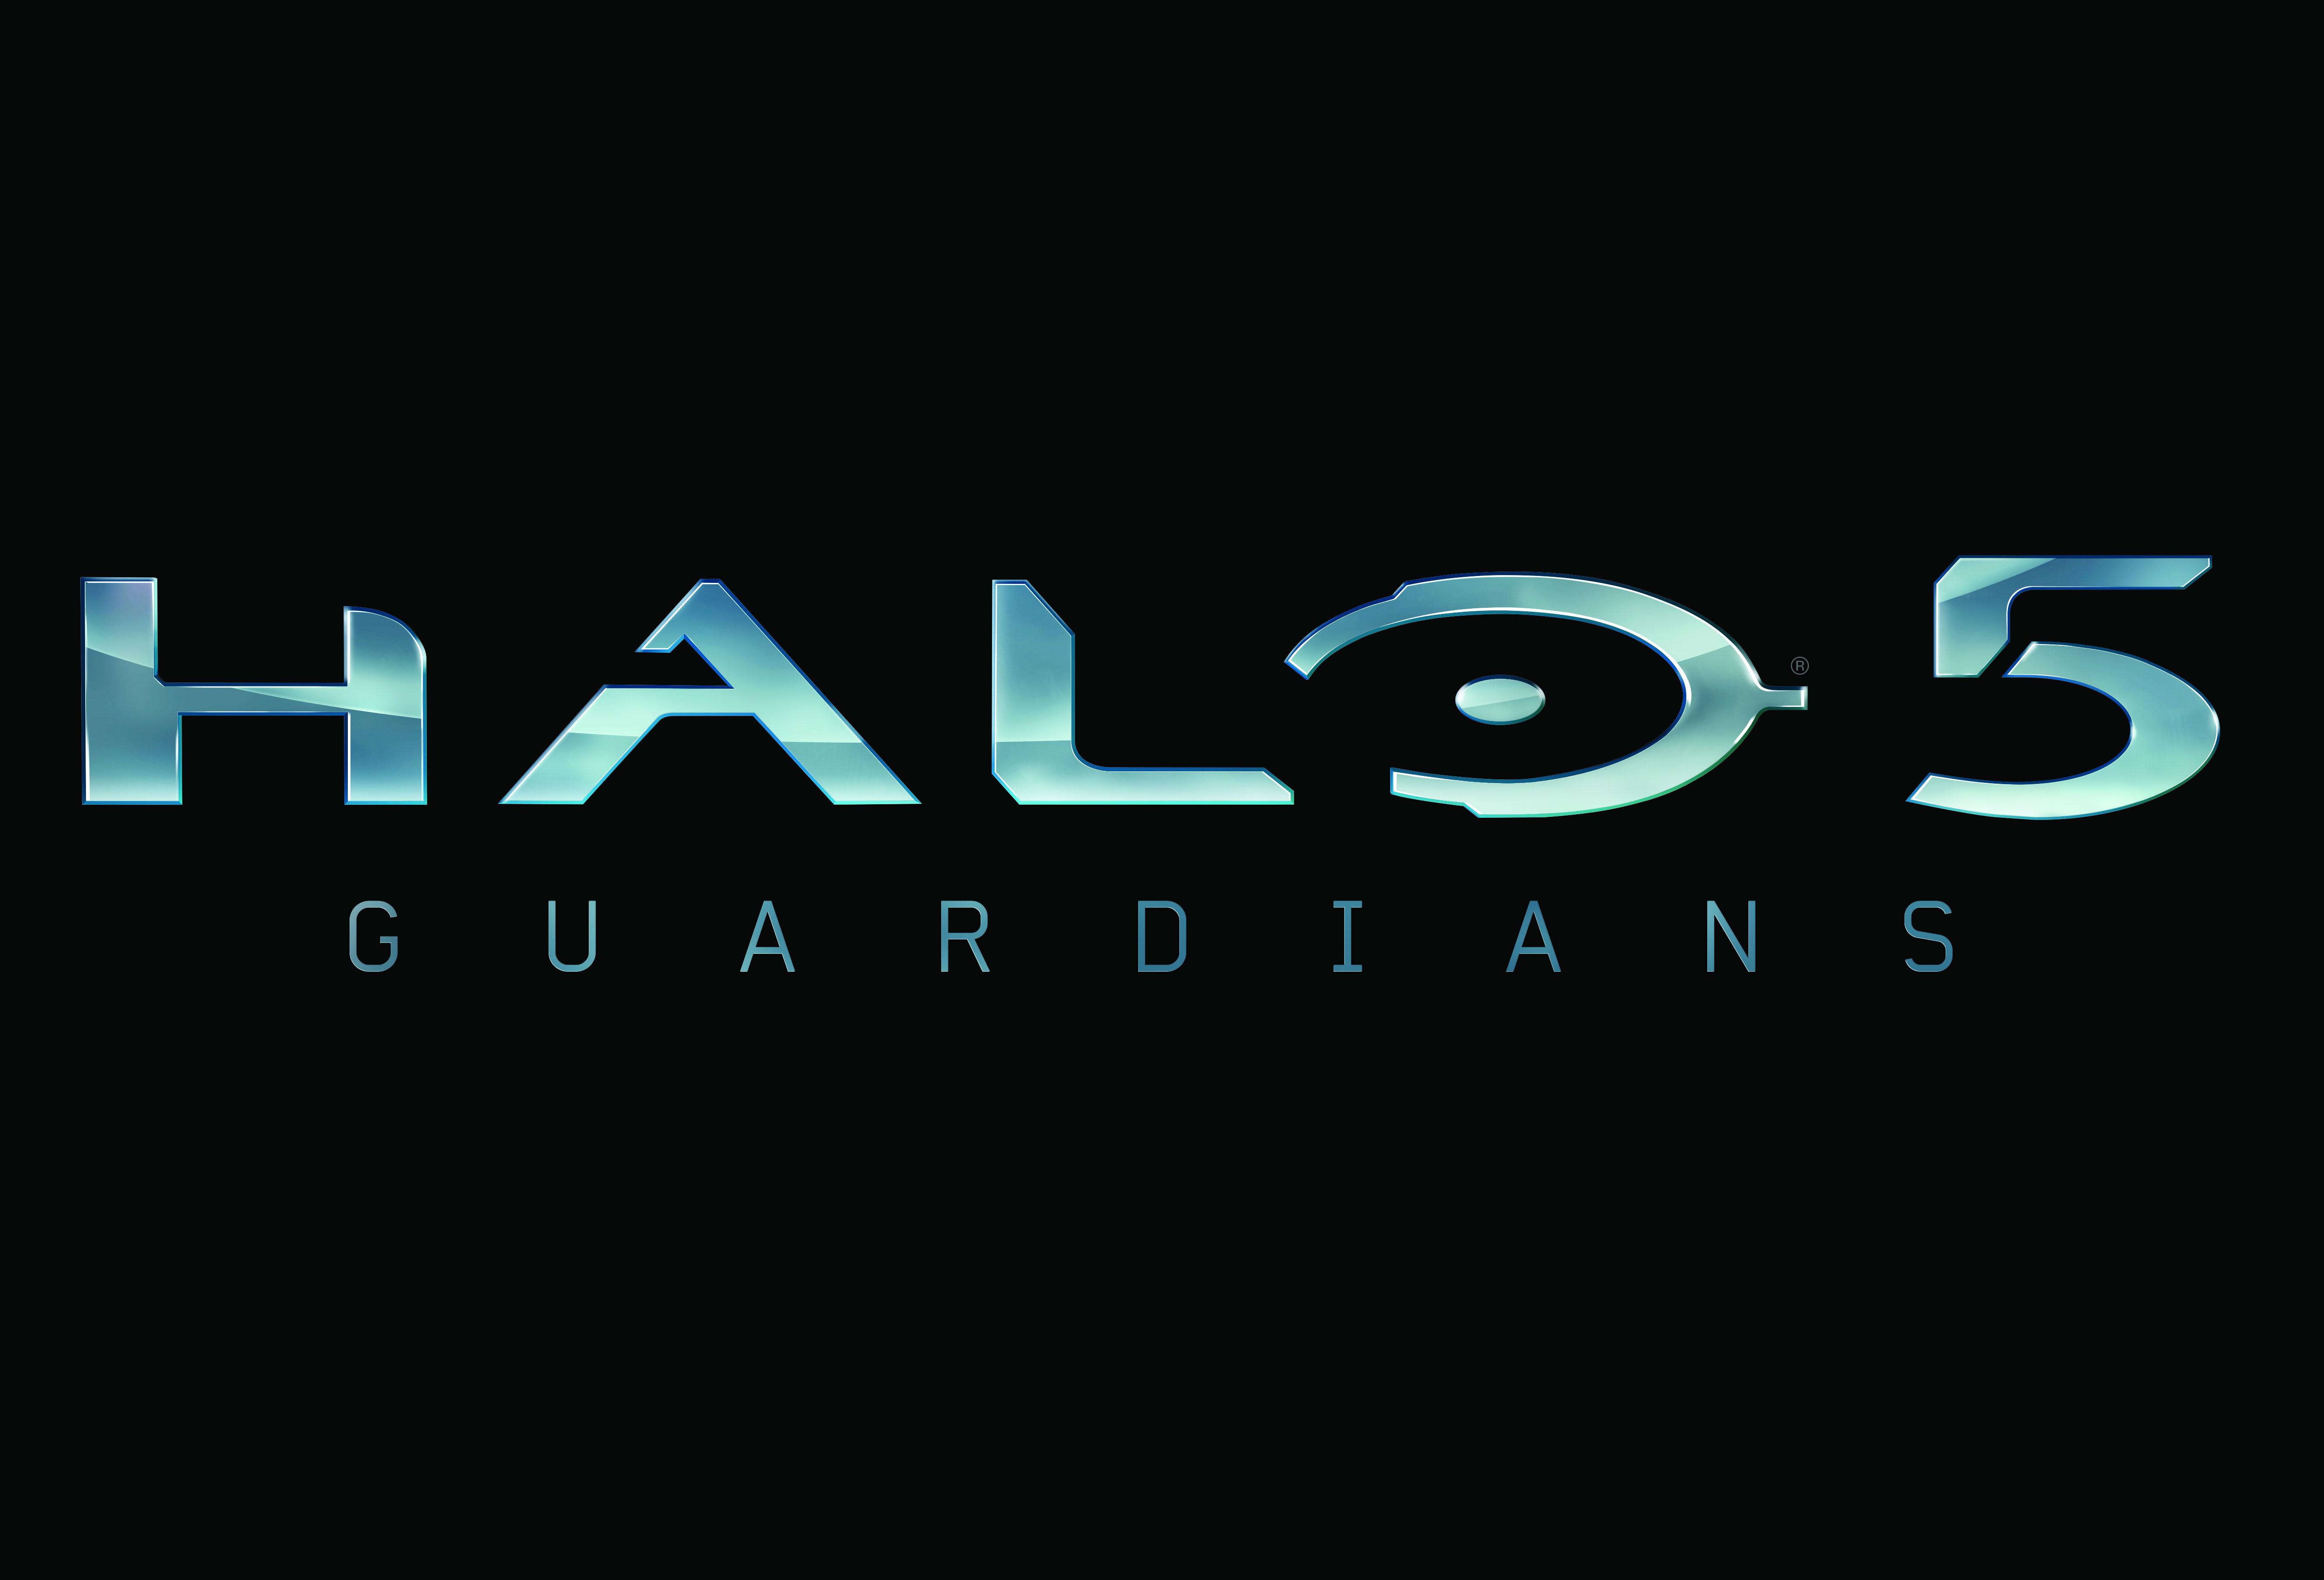 Halo 5 Guardians wallpaper 4